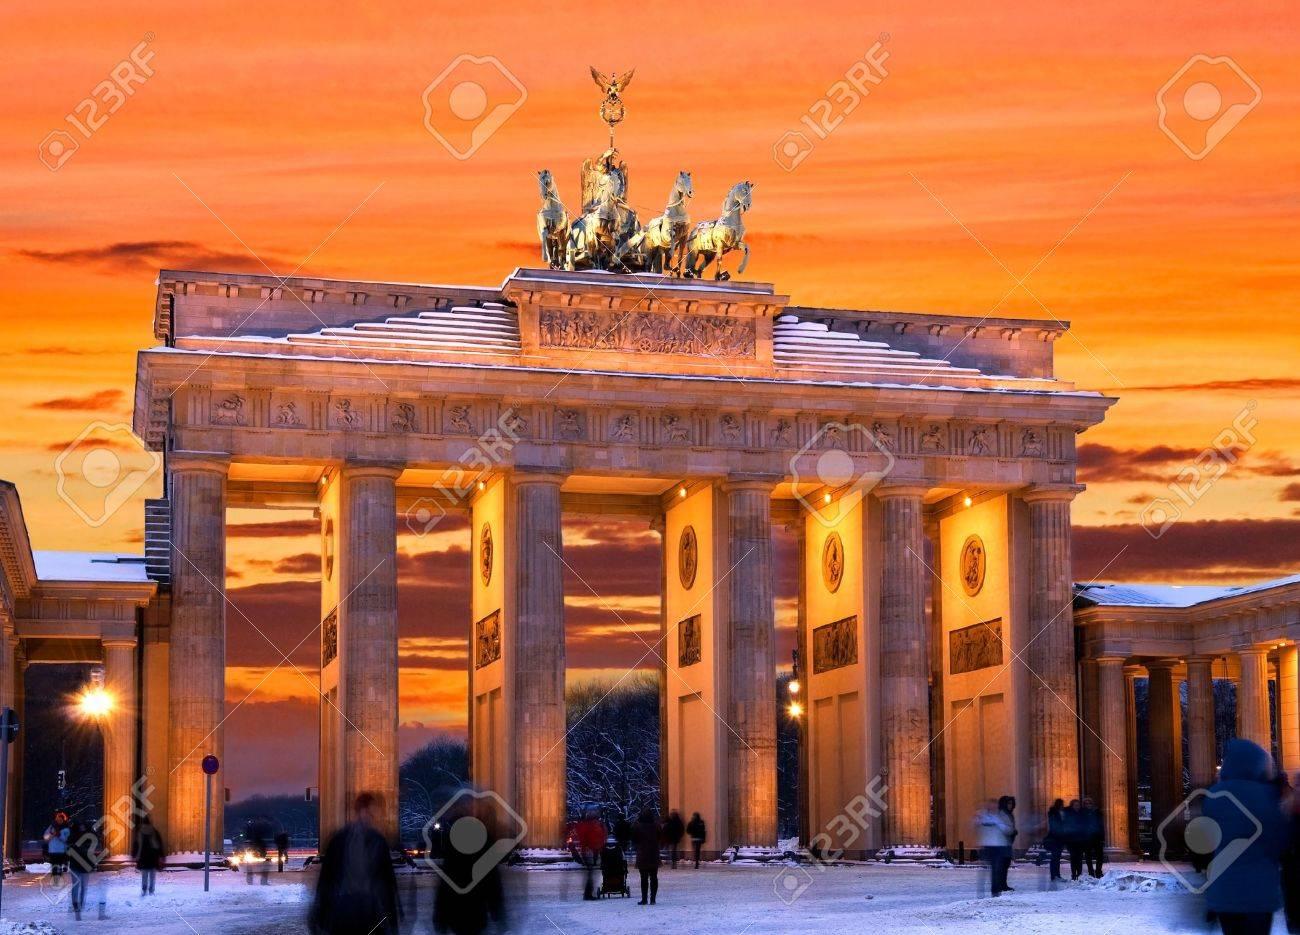 brandenburger tor in winter at sunset in berlin, germany Stock Photo - 15877186